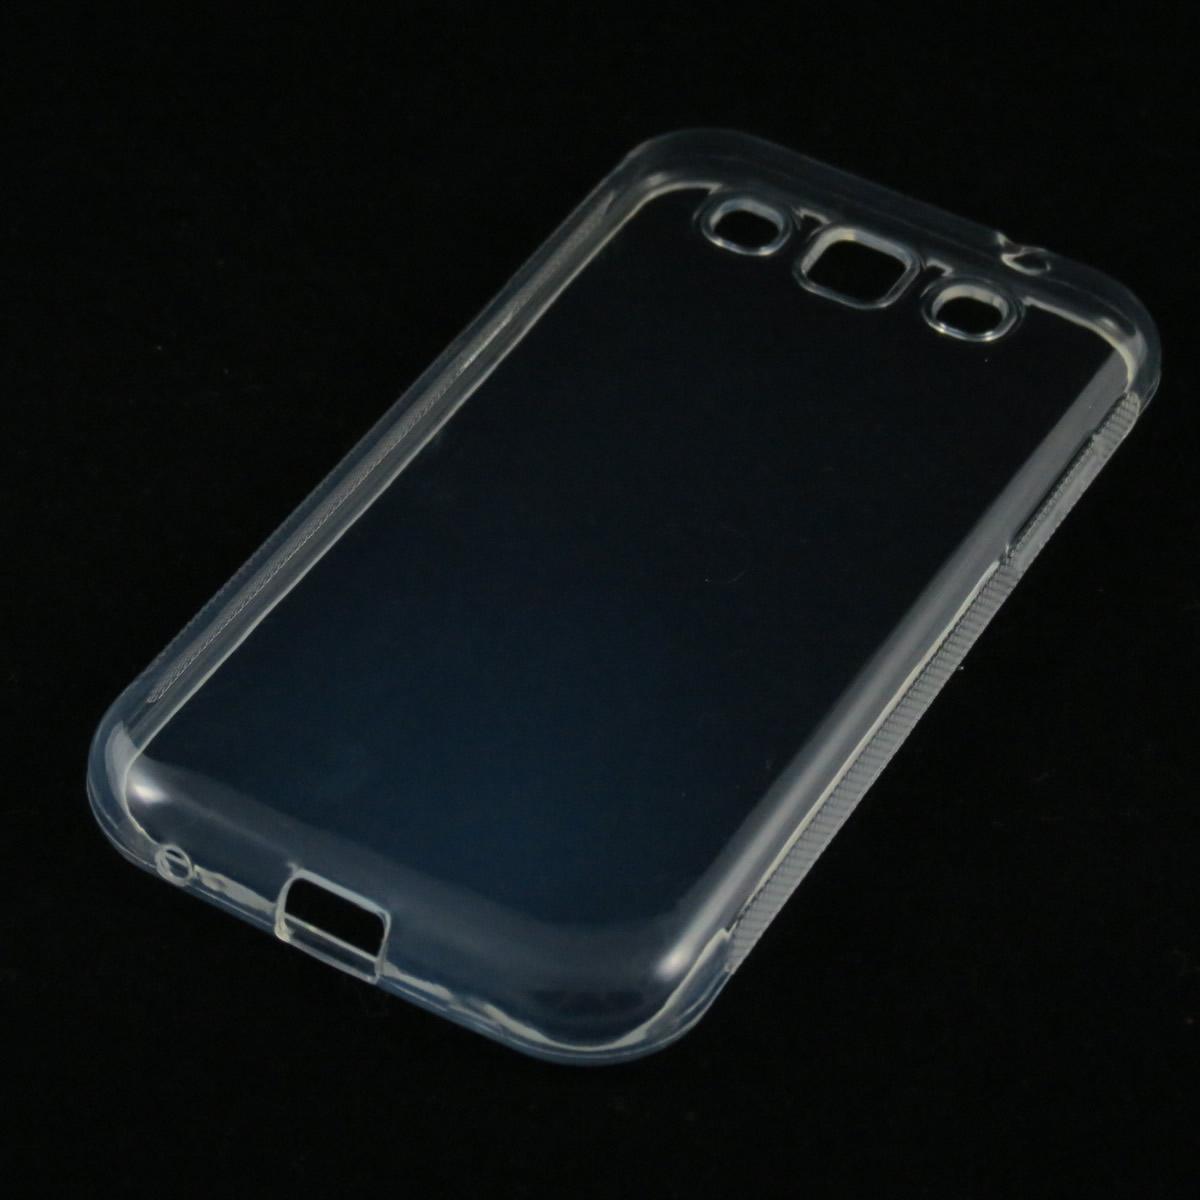 Capa Galaxy Win (I8552) - Transparente Silicone TPU